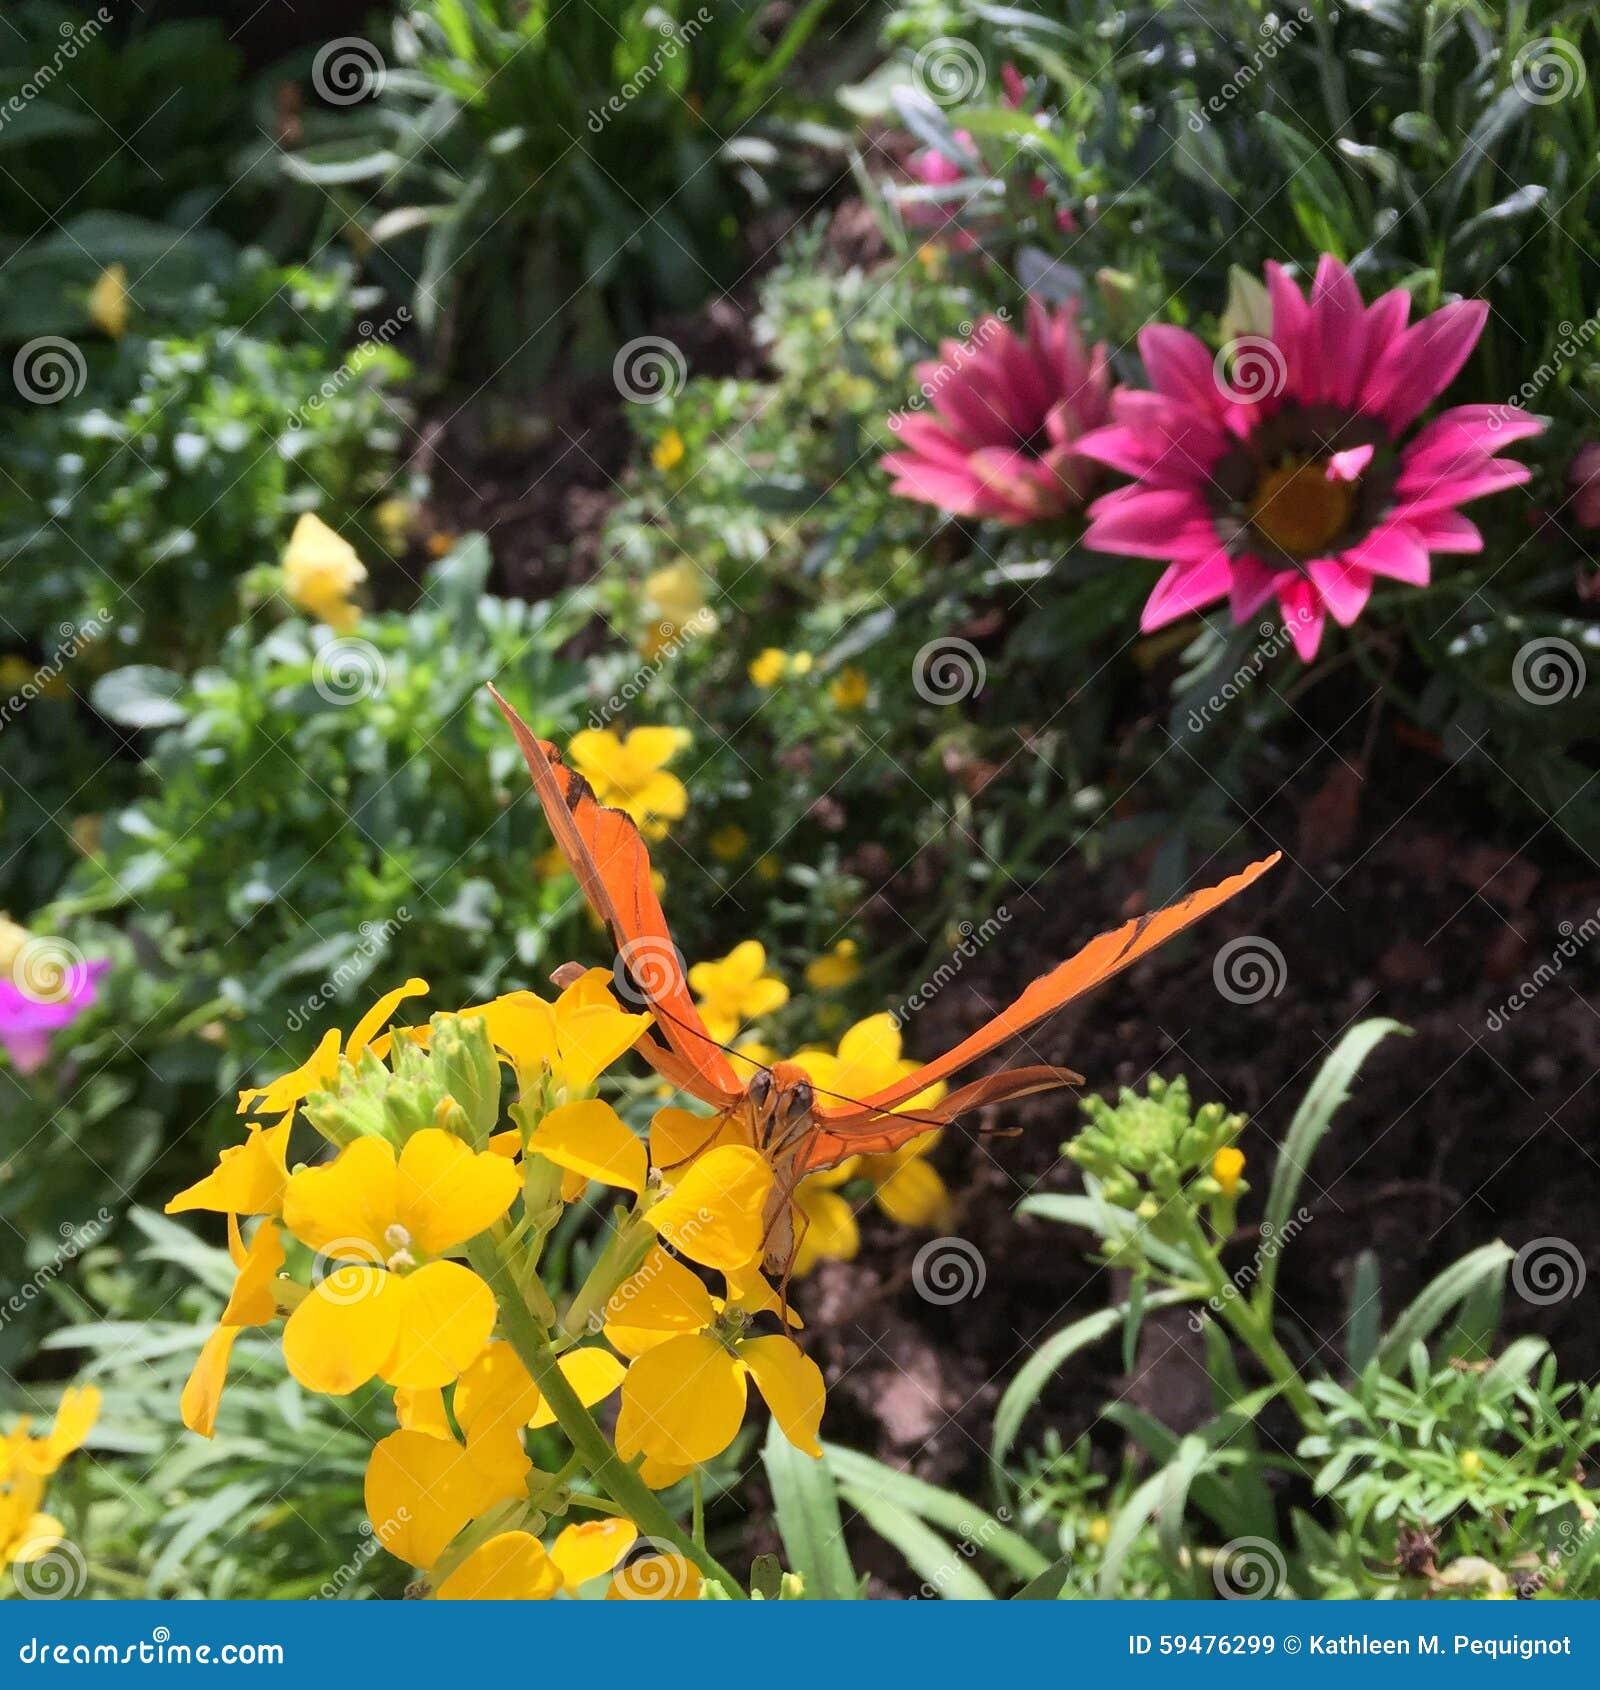 Sunlit garden florals with butterfly.